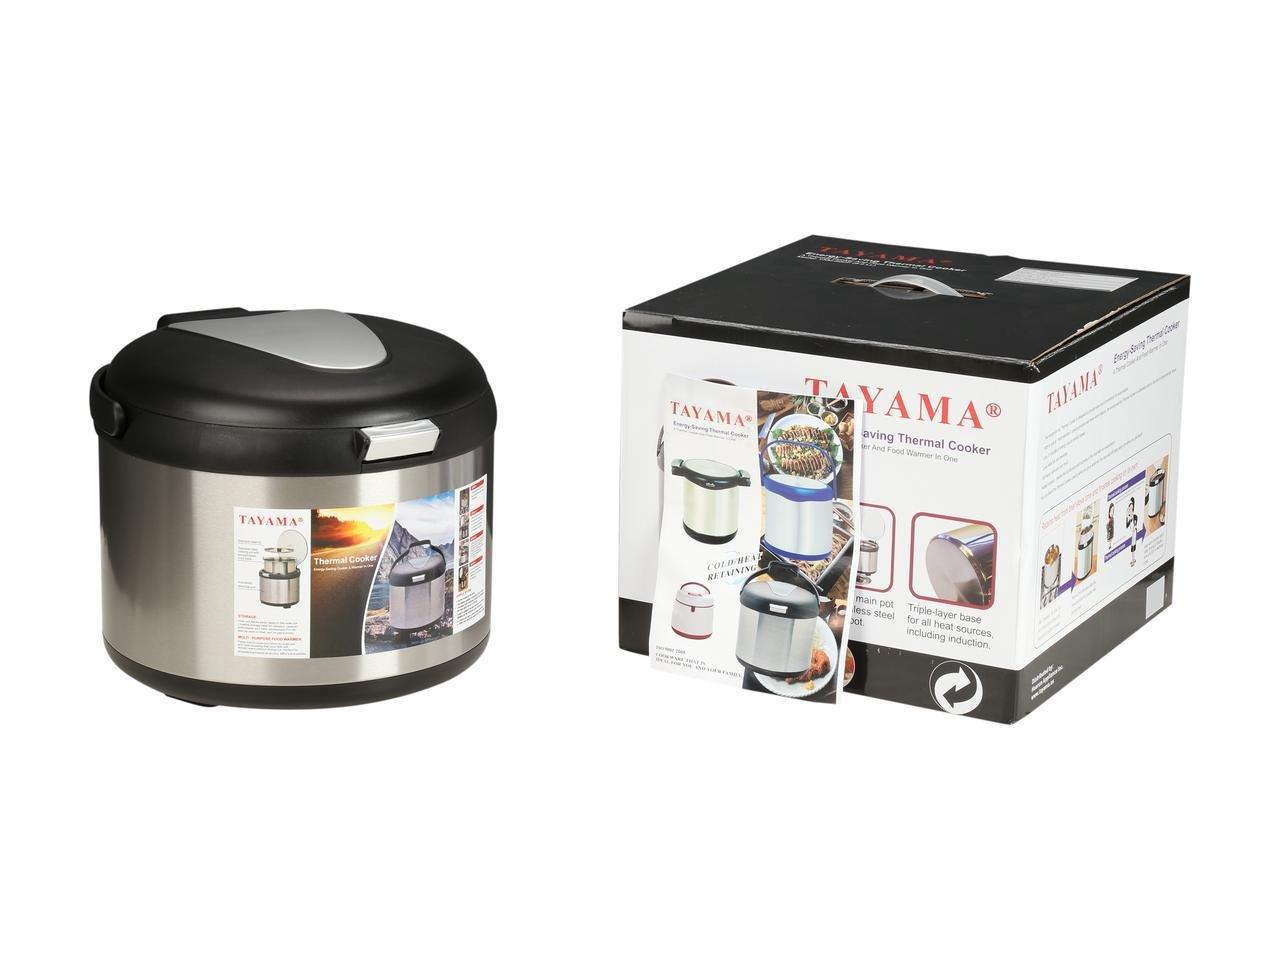 Tayama TXM-50CF Energy-Saving Thermal Cooker, 5 L, Black by TAYAMA (Image #8)